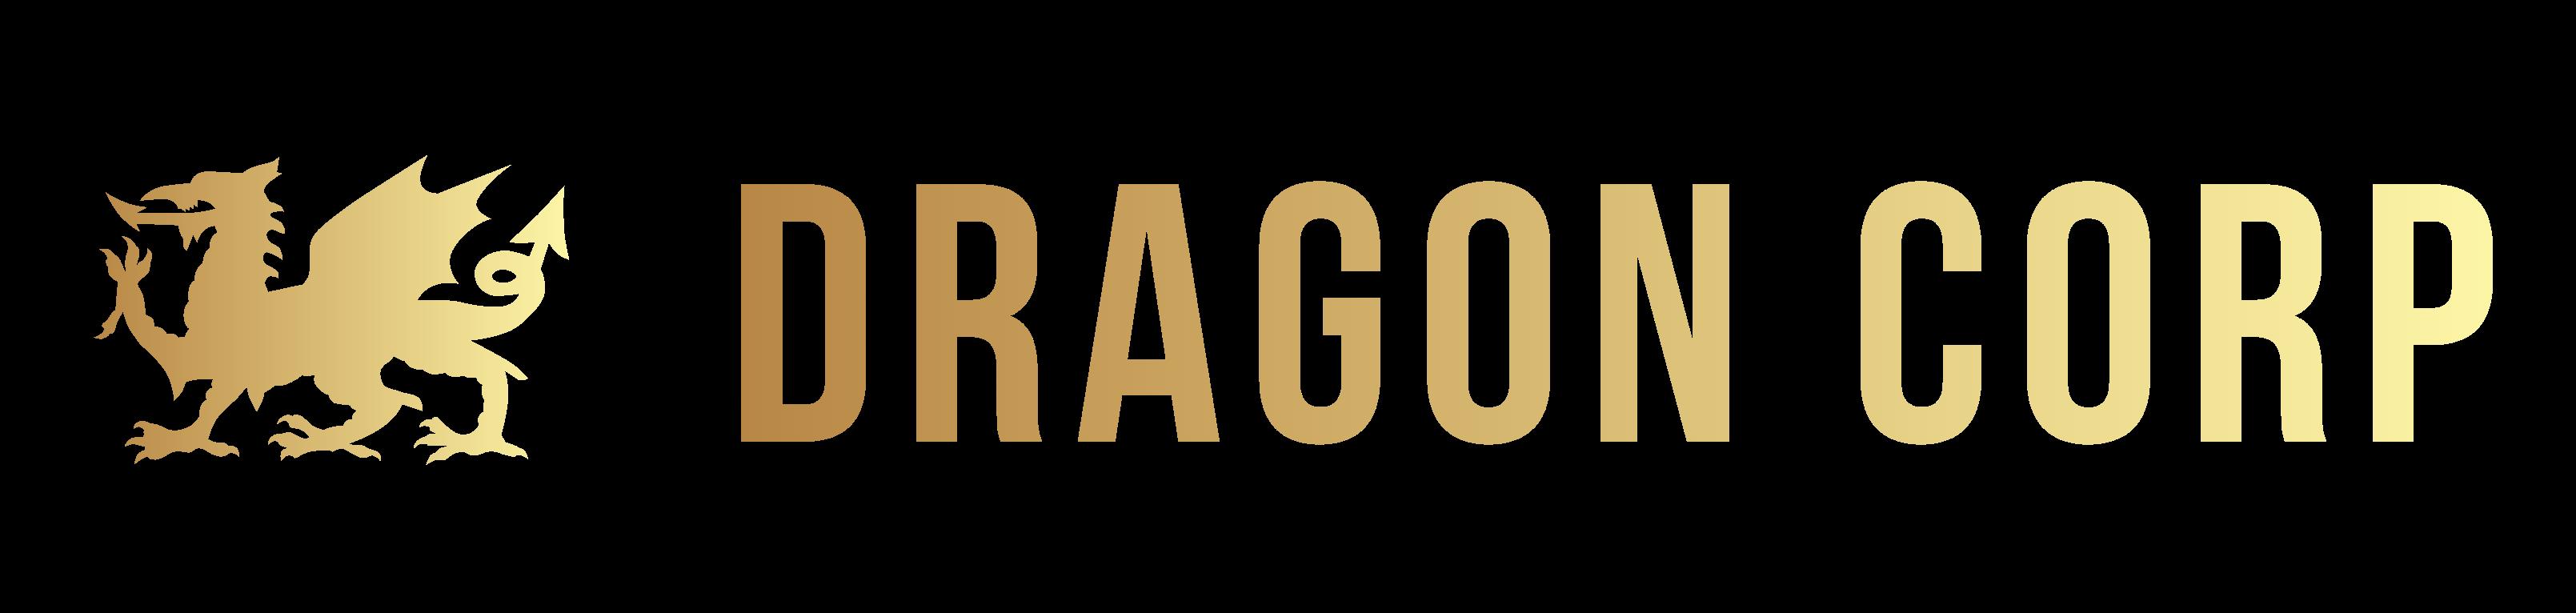 Dragon Corp